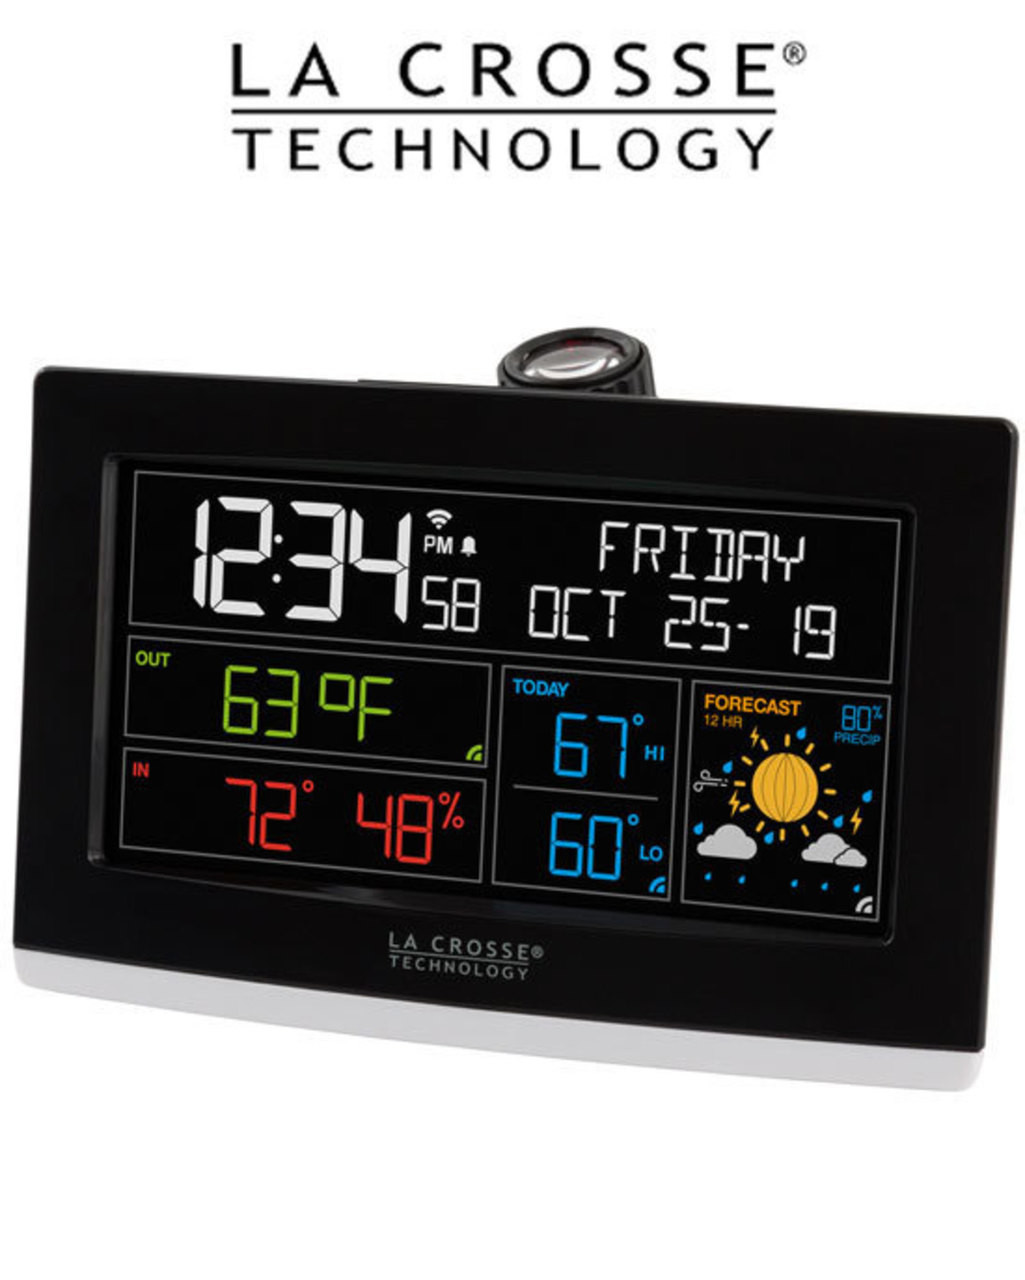 La Crosse C82929 WiFi Projection Alarm Clock with AccuWeather